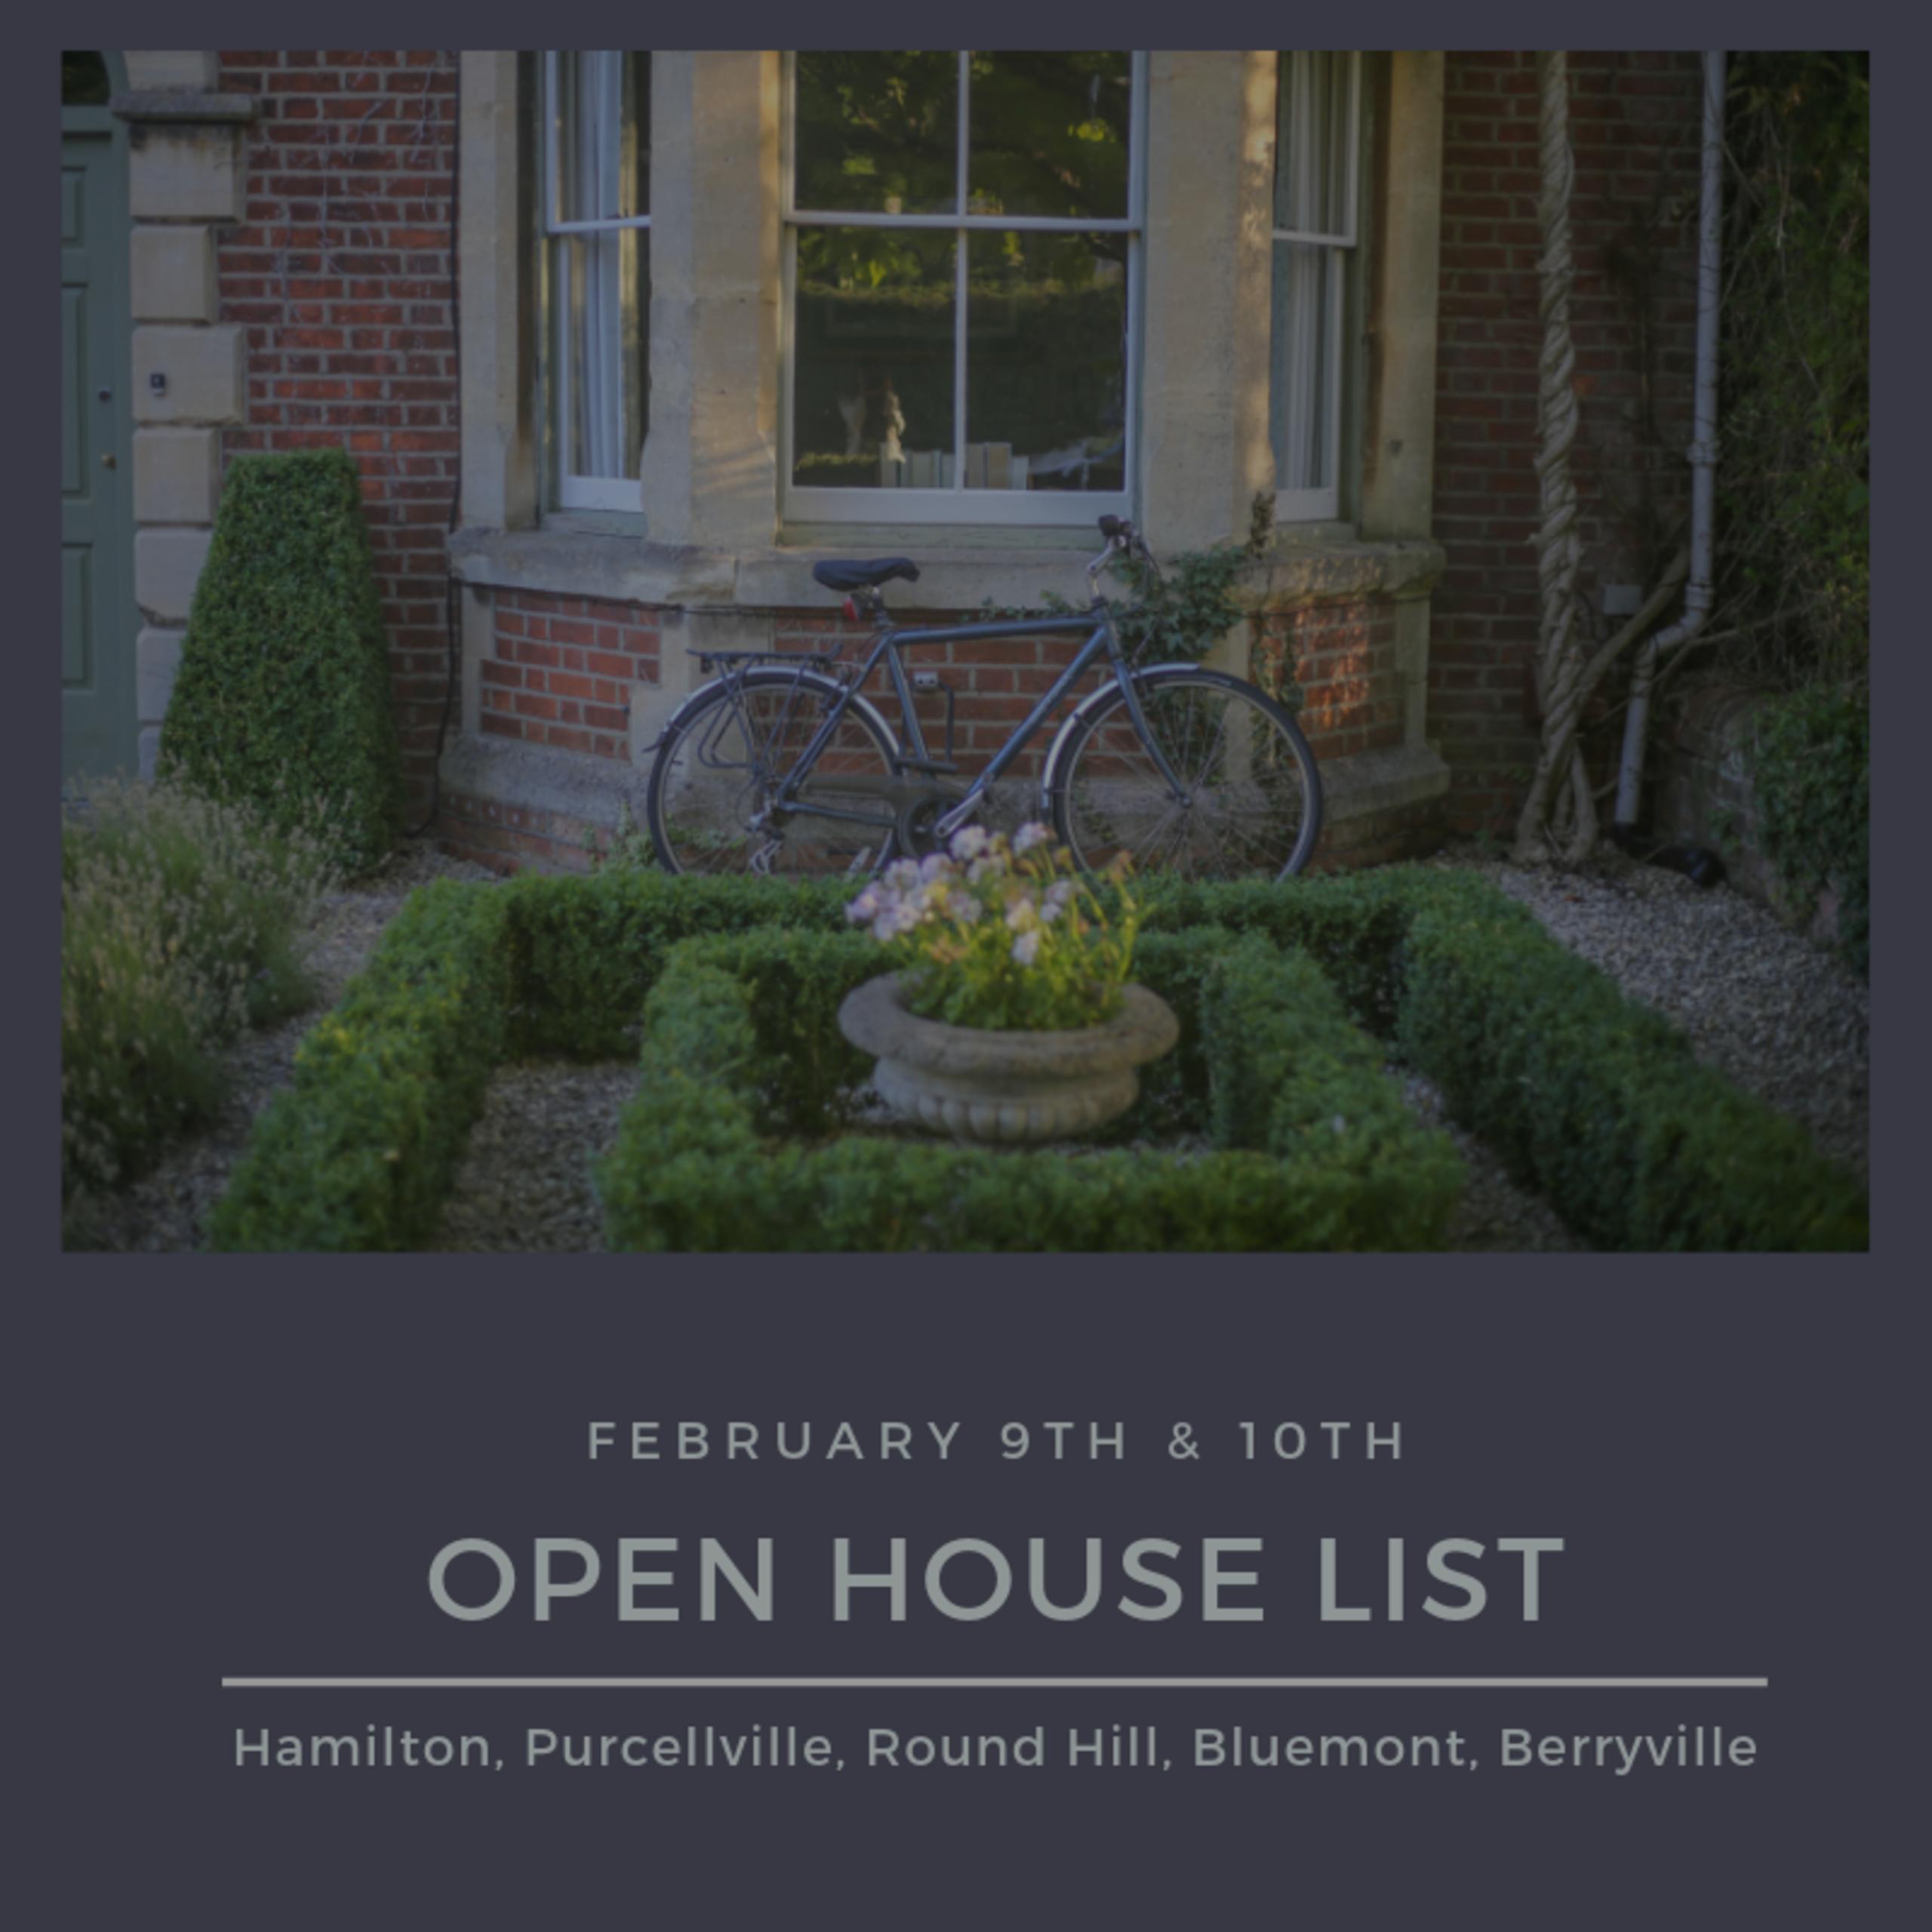 Open House List 2/9/19 – 2/10/19